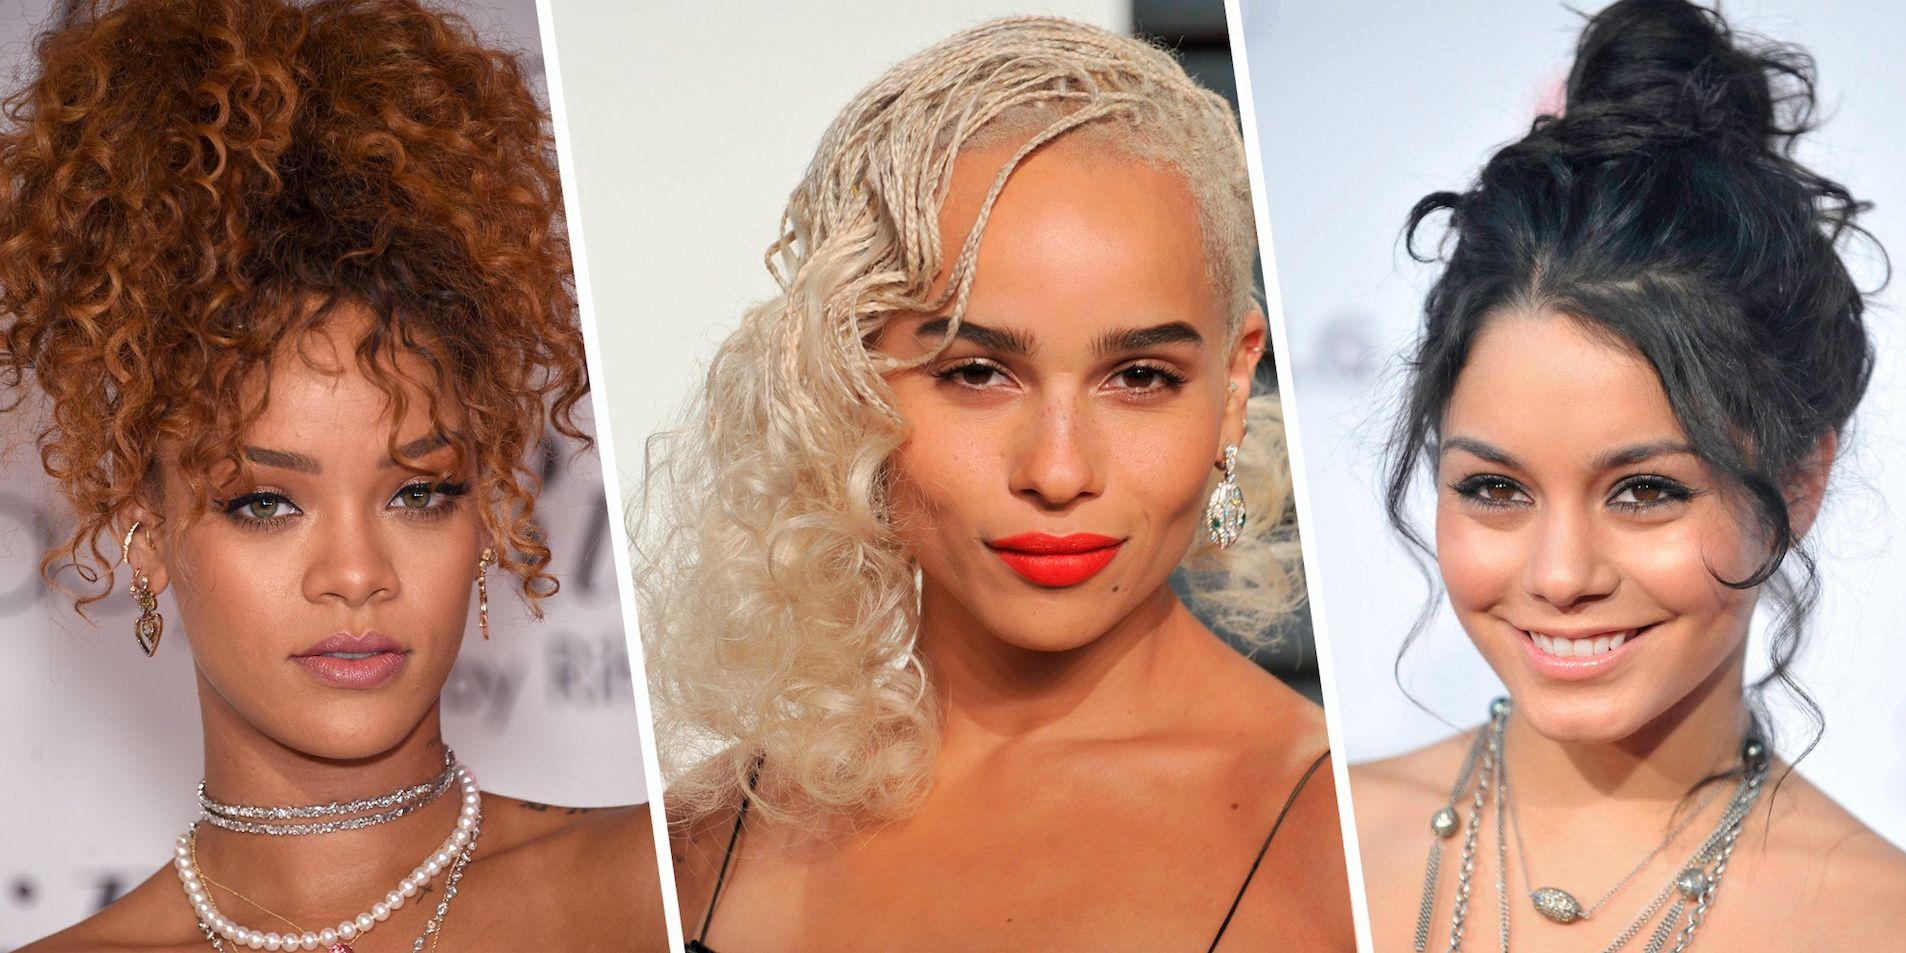 19 Side Fringe Hairstyles For 2019 Celebrity Inspiration